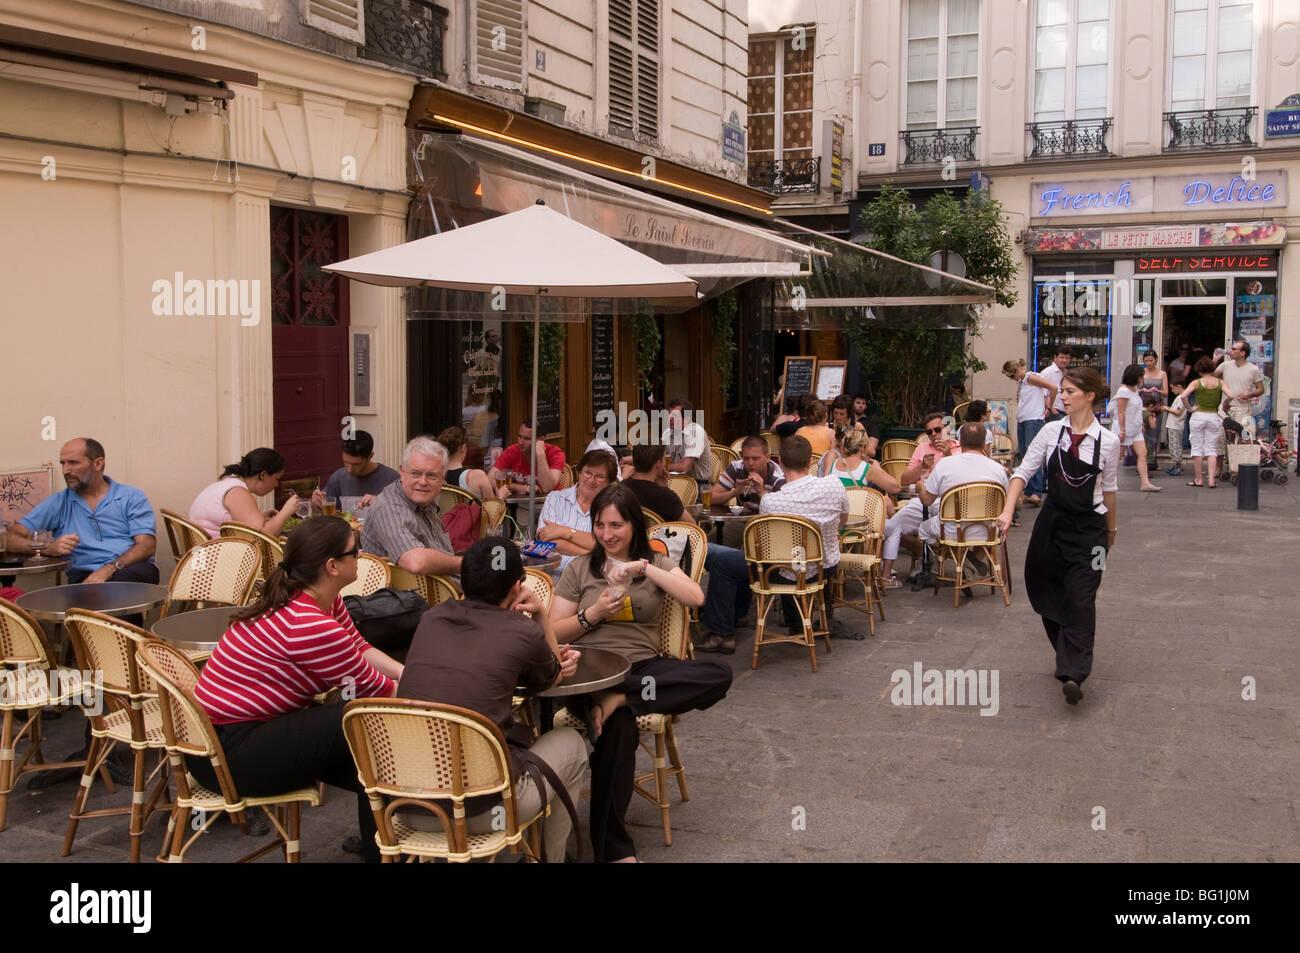 Bistrot, Rue Saint-Severin, Quartier Latin, Paris, France, Europe - Stock Image